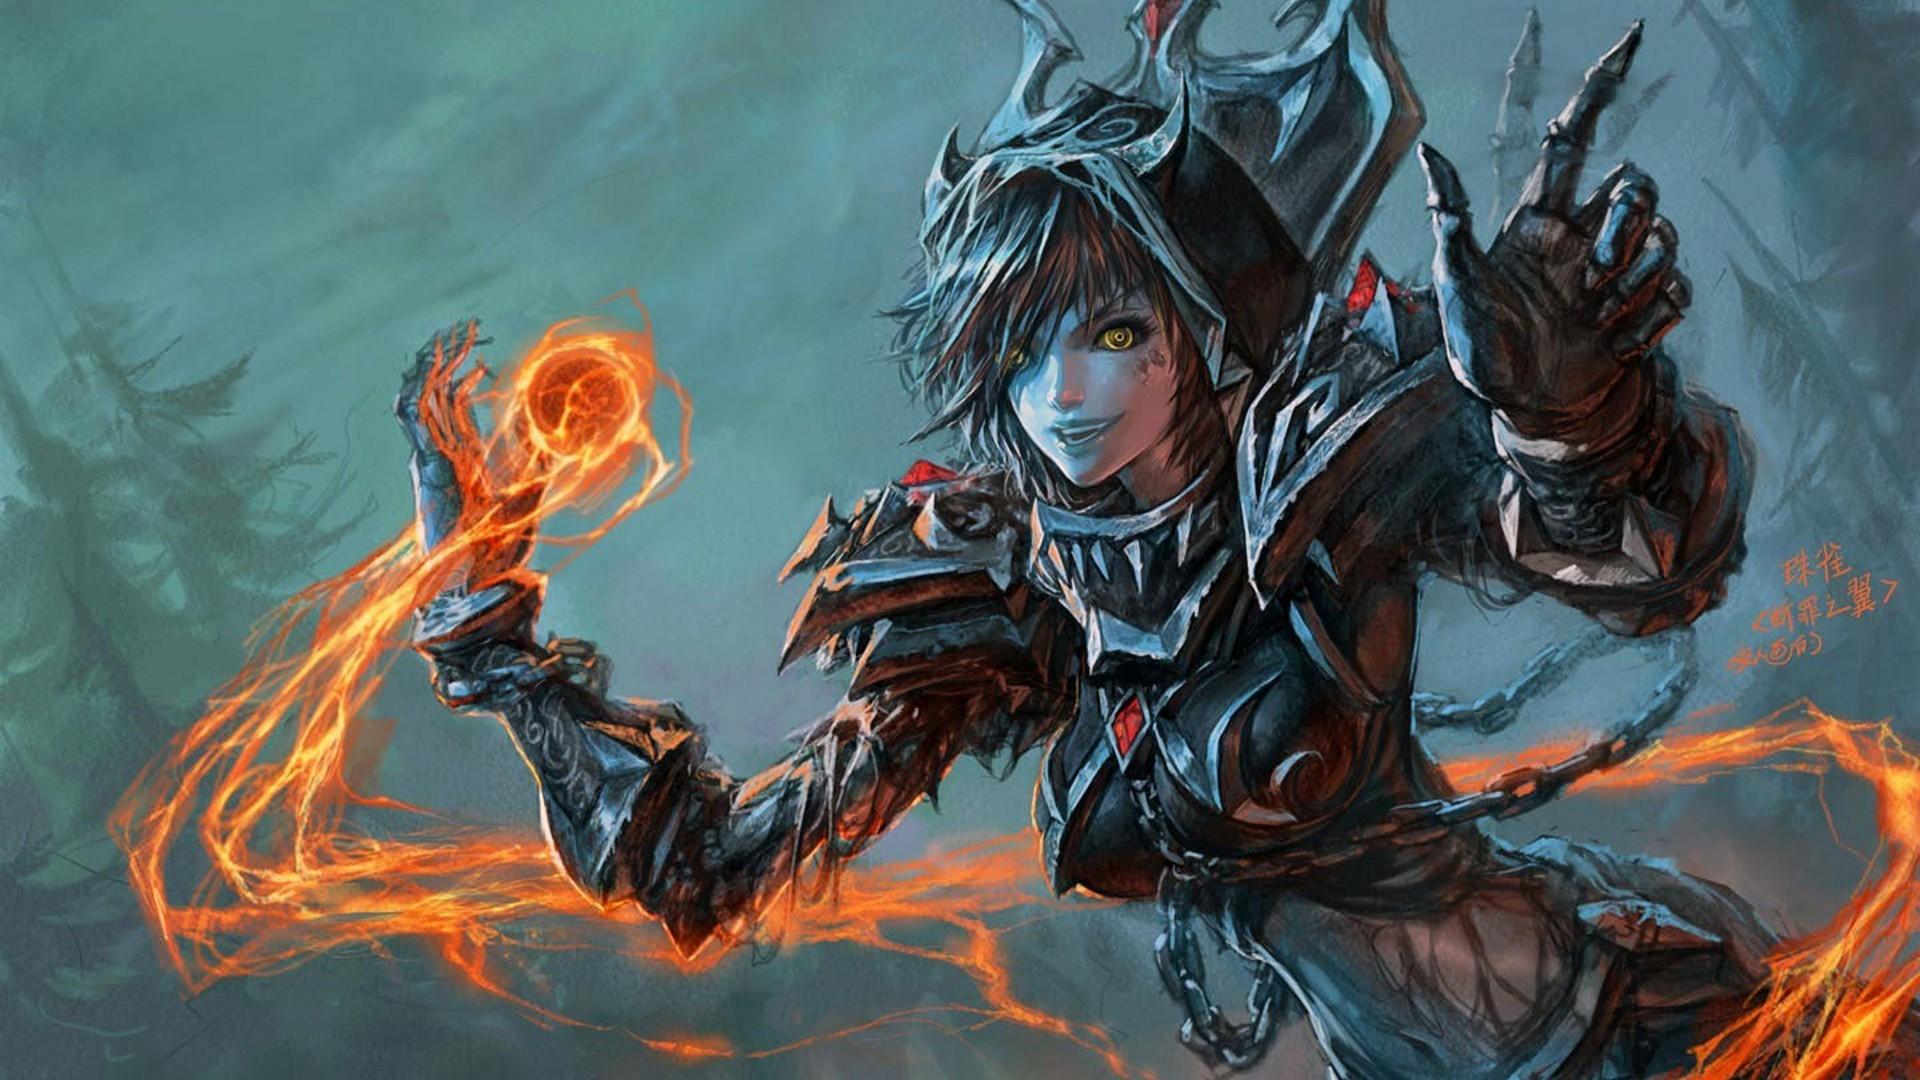 Wallpaper : video games, fantasy art, fantasy girl, anime